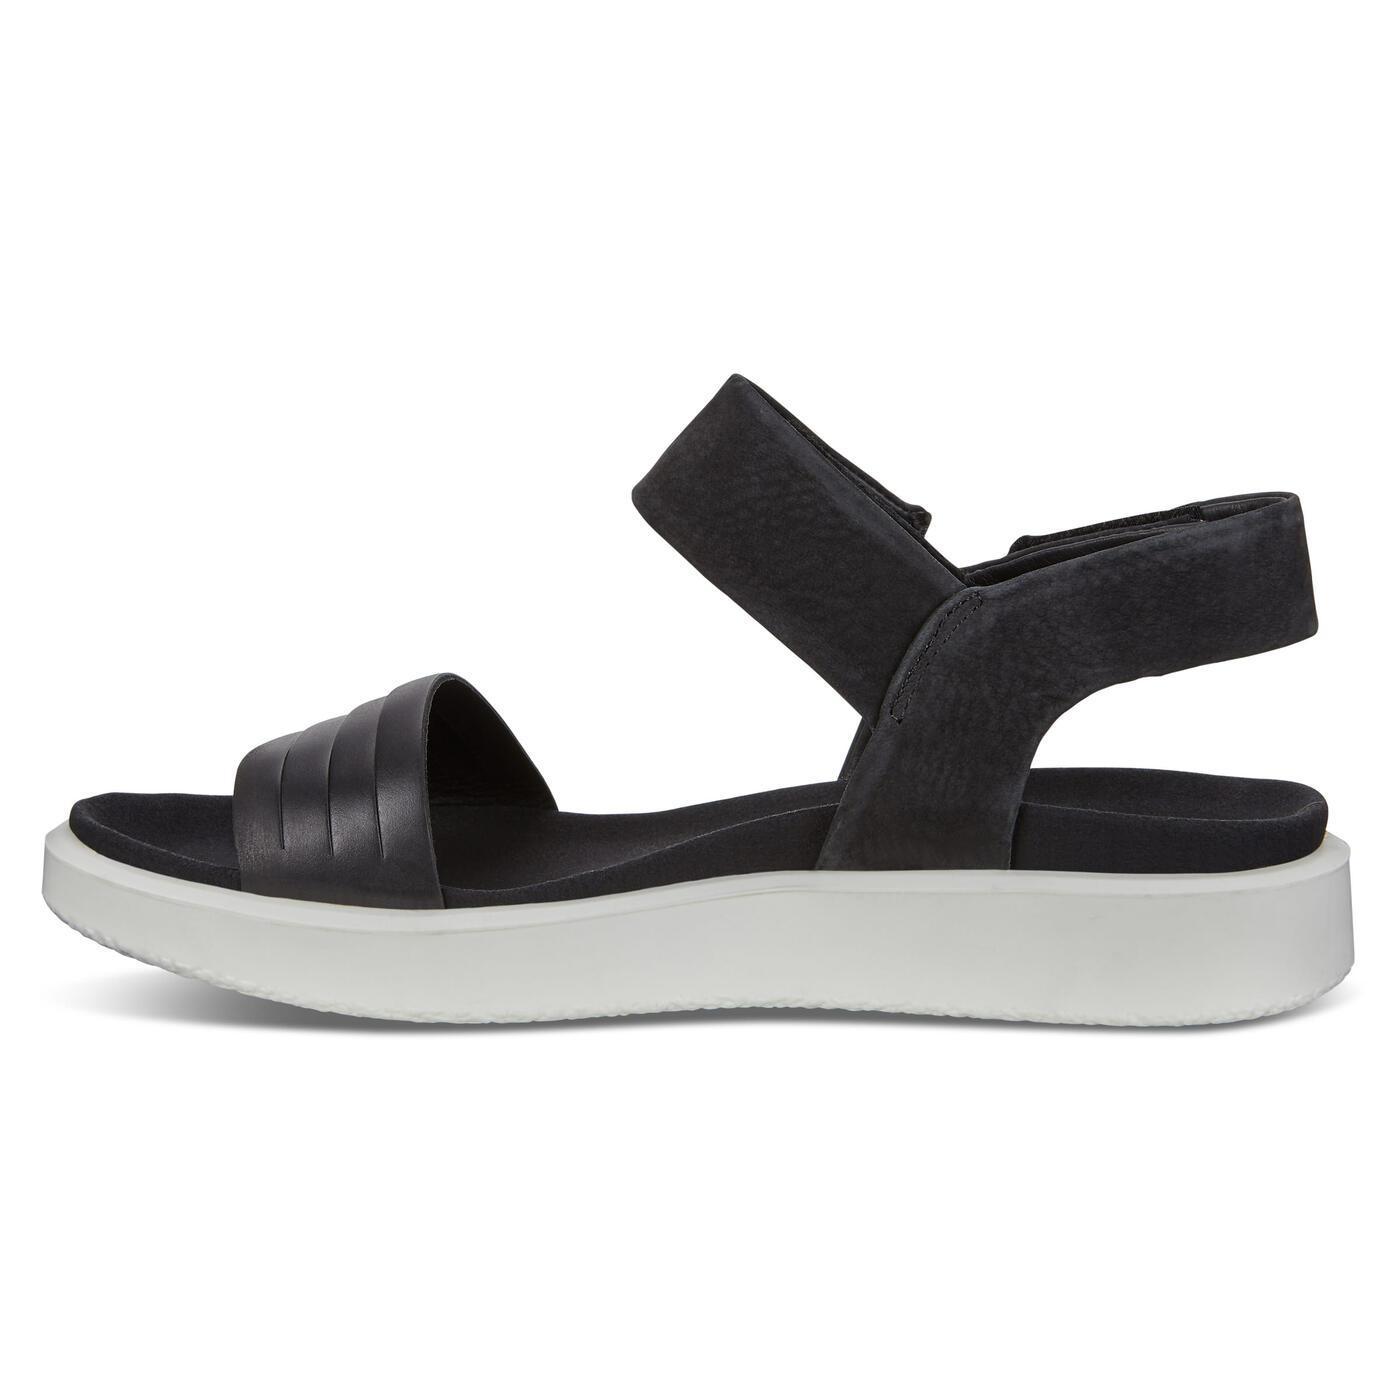 ECCO Flowt Women's Flat Contrast Sole Sandals